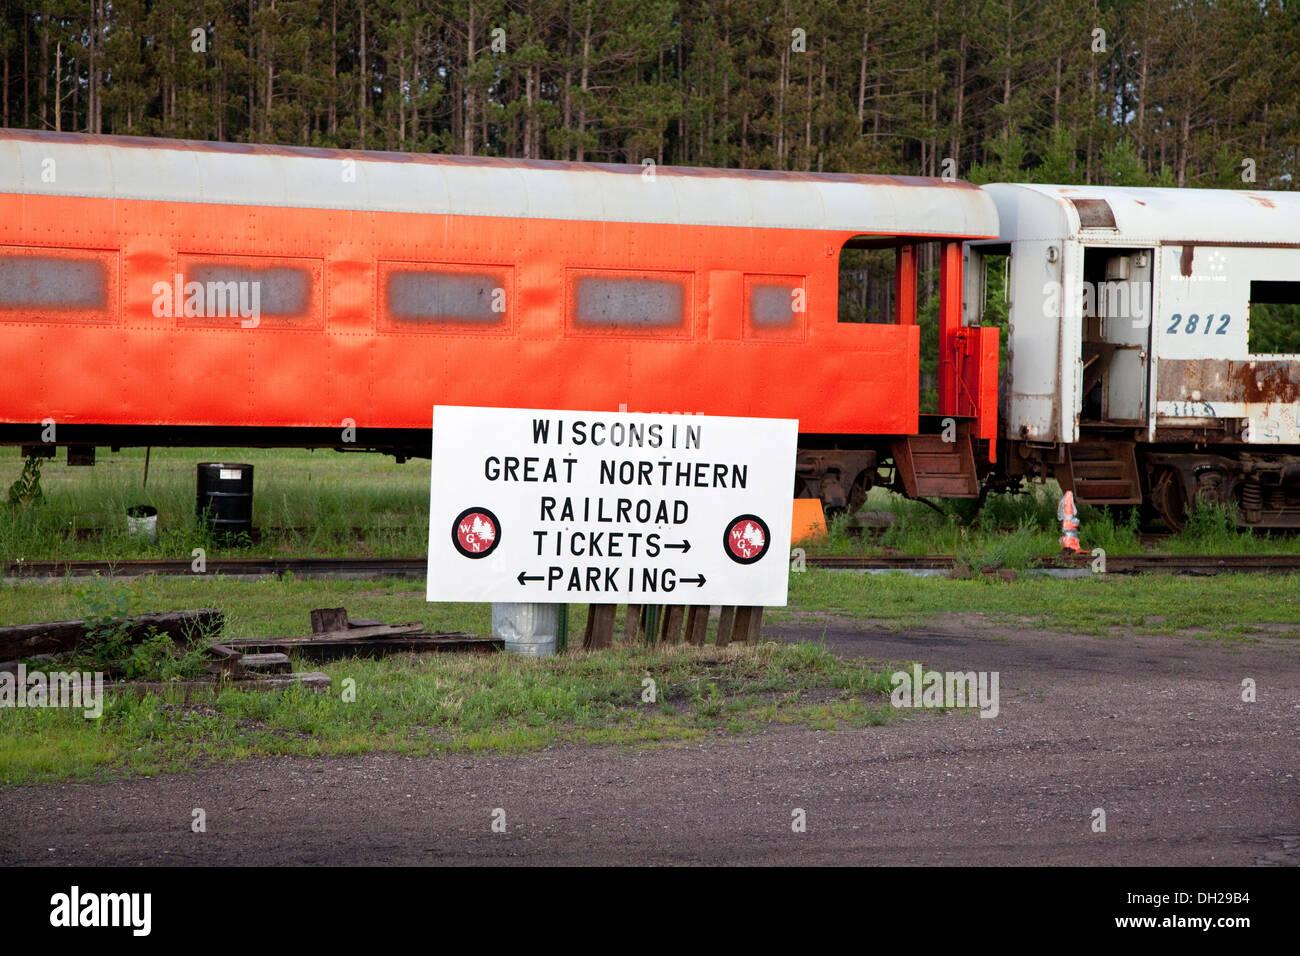 Orange restored antique passenger railroad car. Great Northern Railroad Spooner Wisconsin WI USA - Stock Image